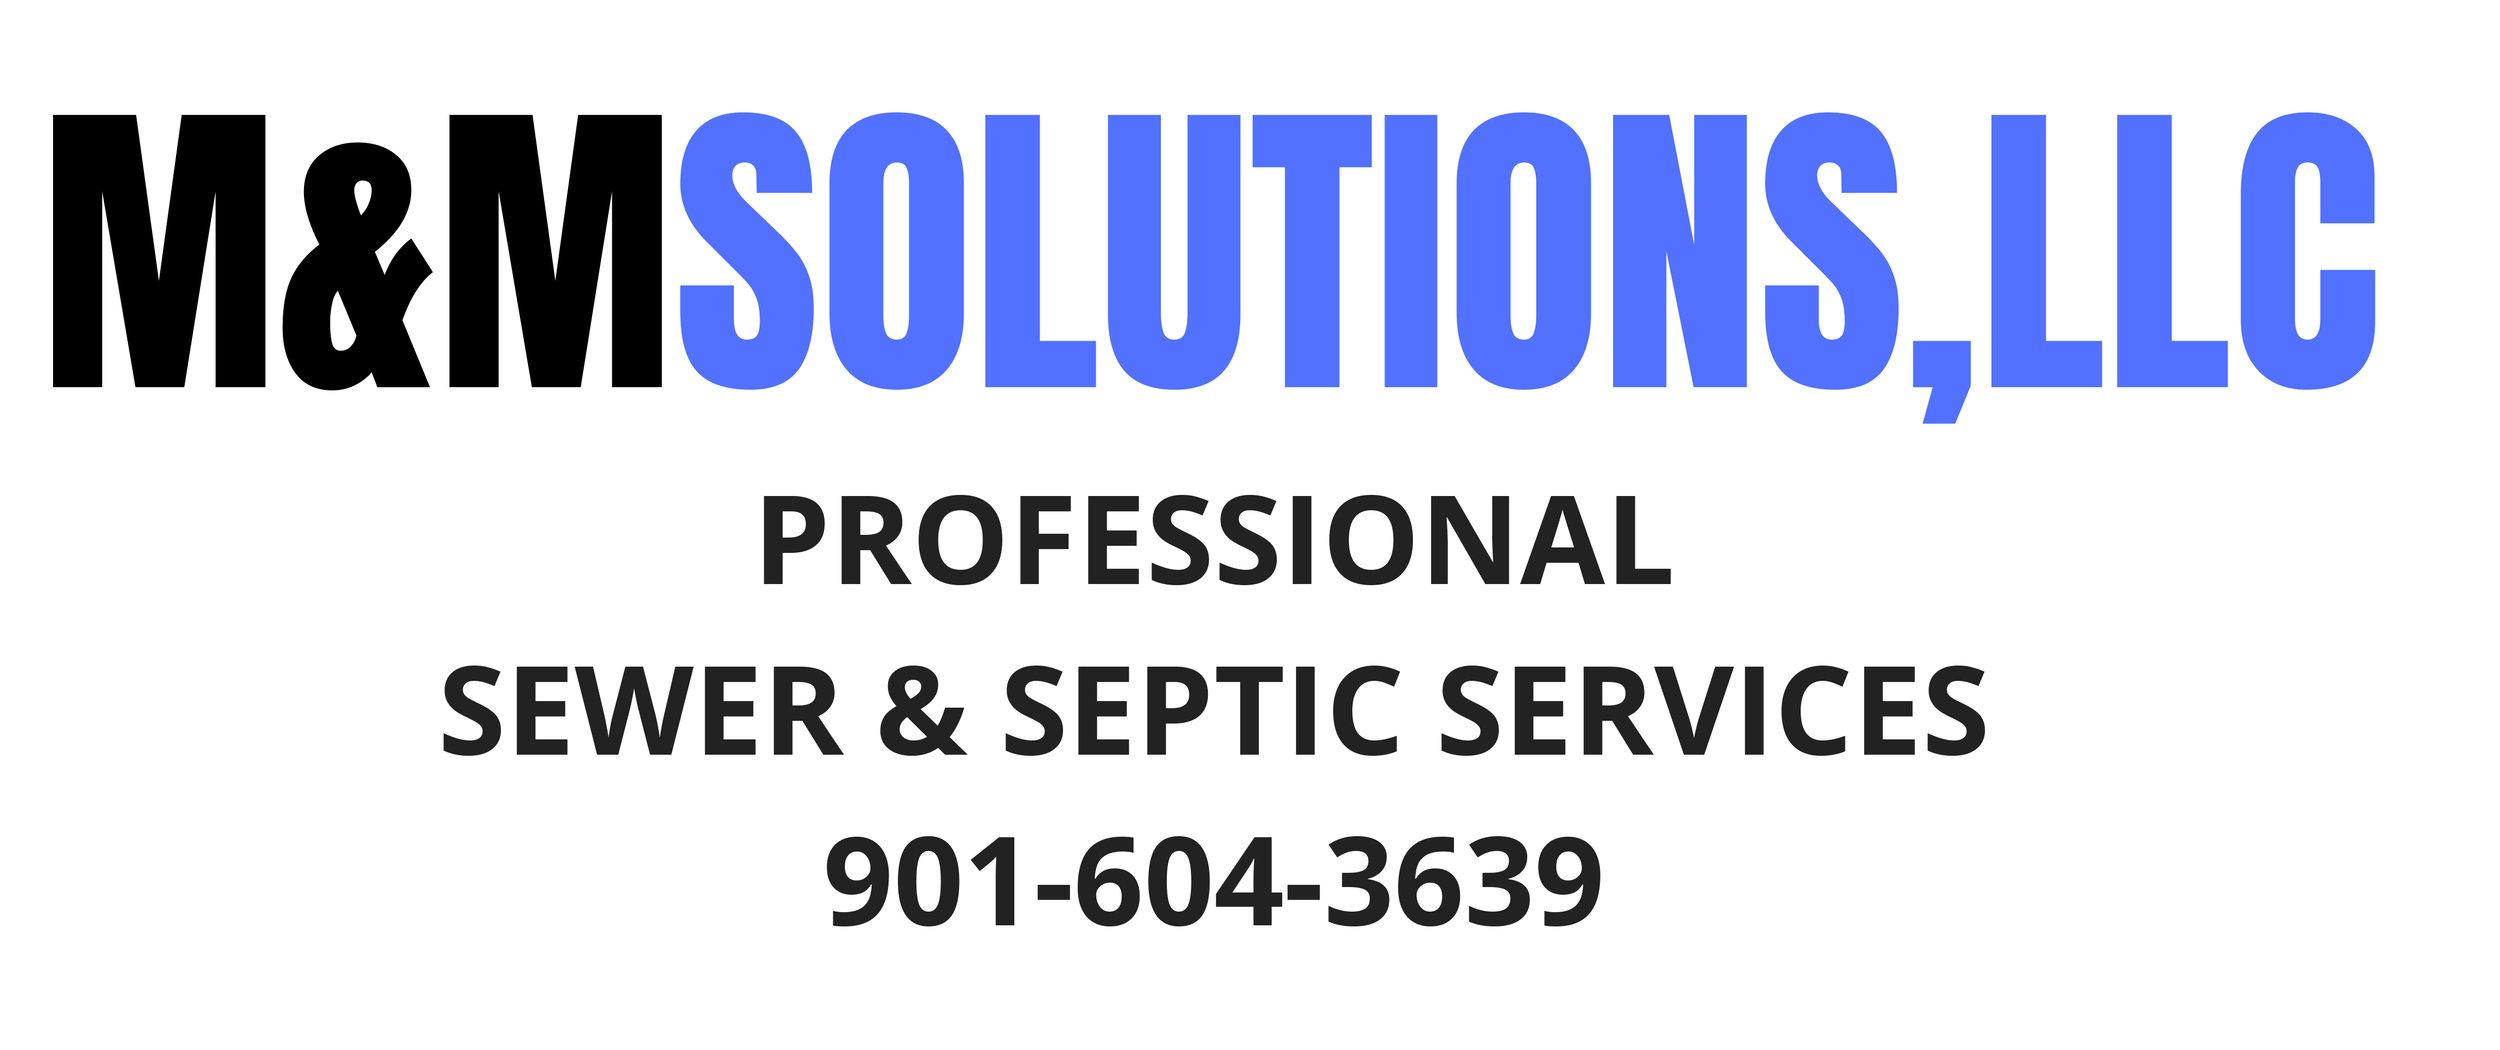 LOGO - M&M SOLUTIONS, LLC.jpg